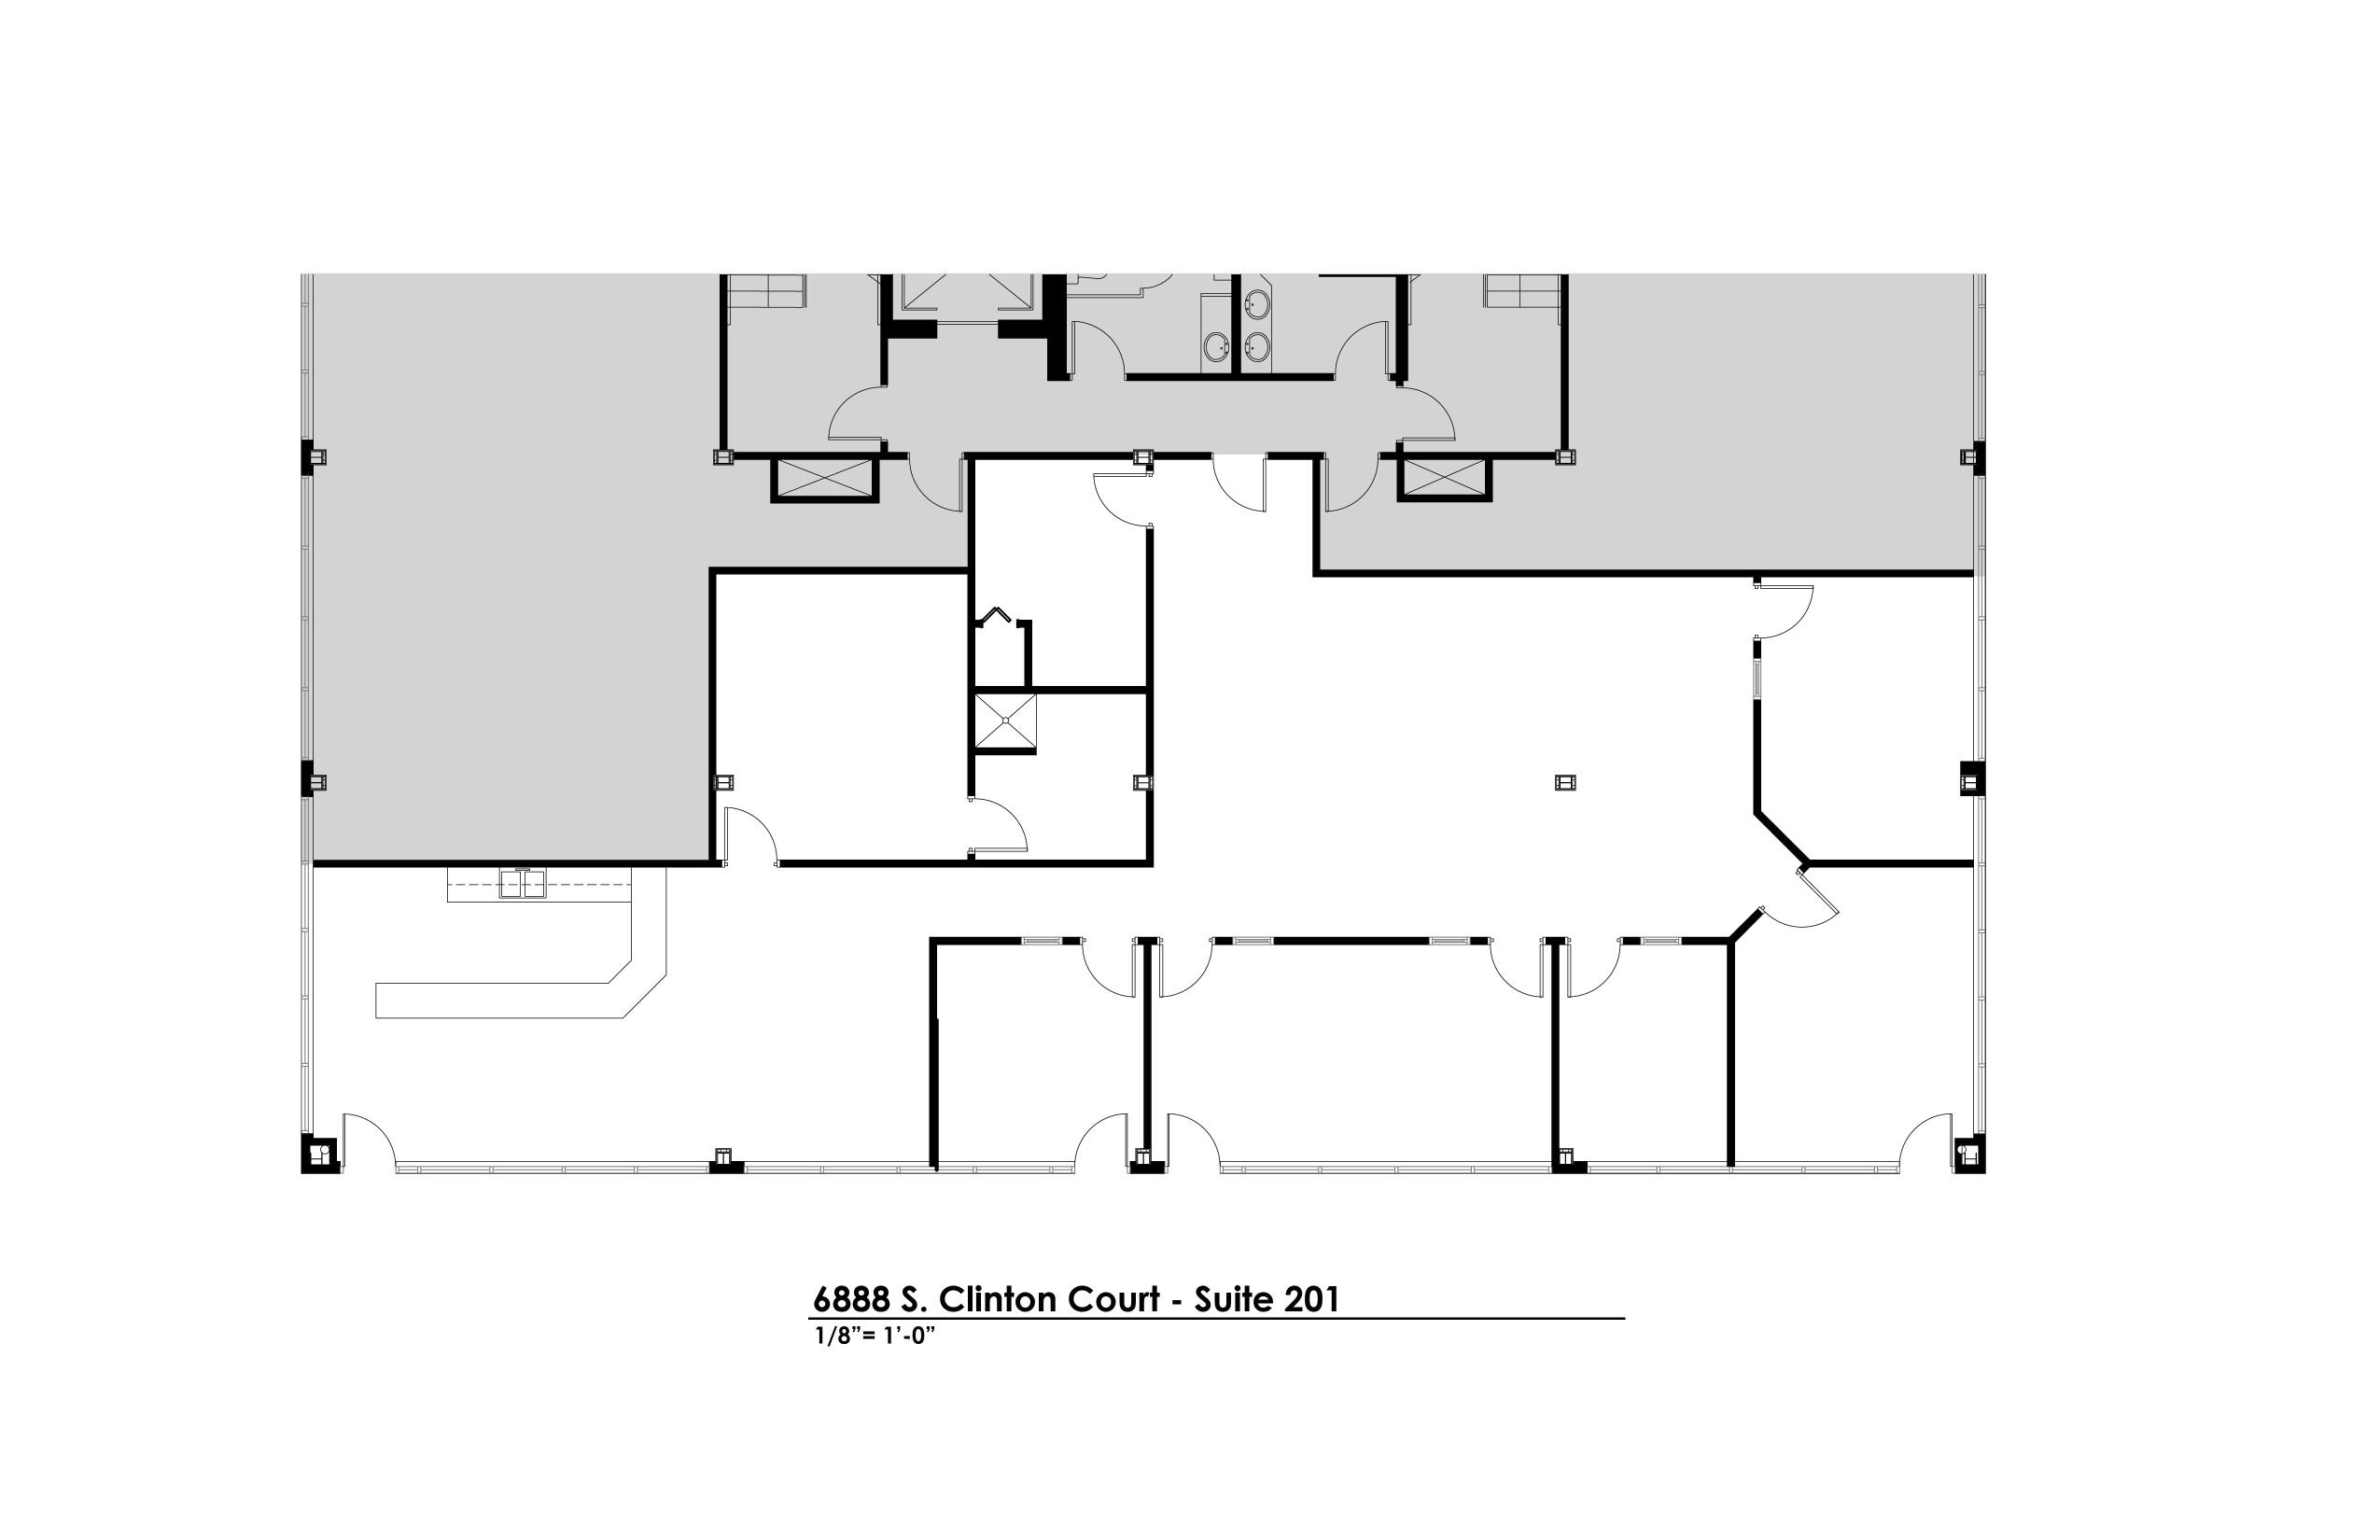 Suite 201 - Floorplan